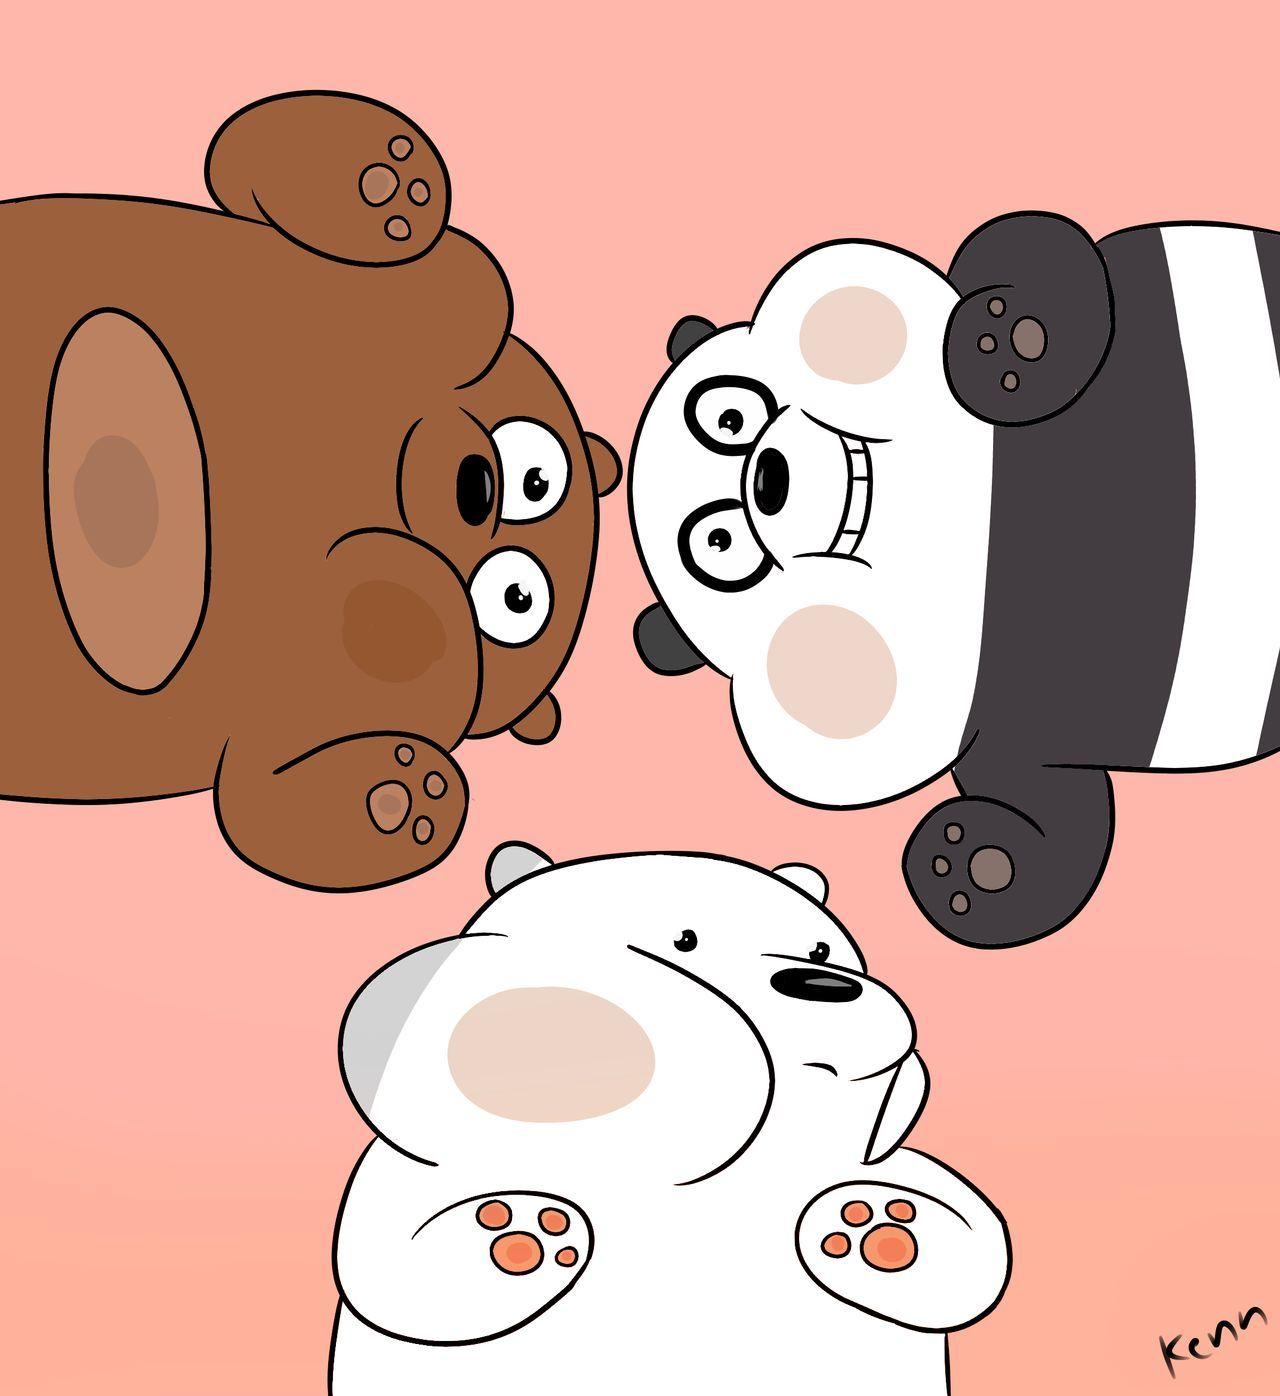 We Bare Bears By Rooooop On Deviantart We Bare Bears Wallpapers Bear Wallpaper Ice Bear We Bare Bears